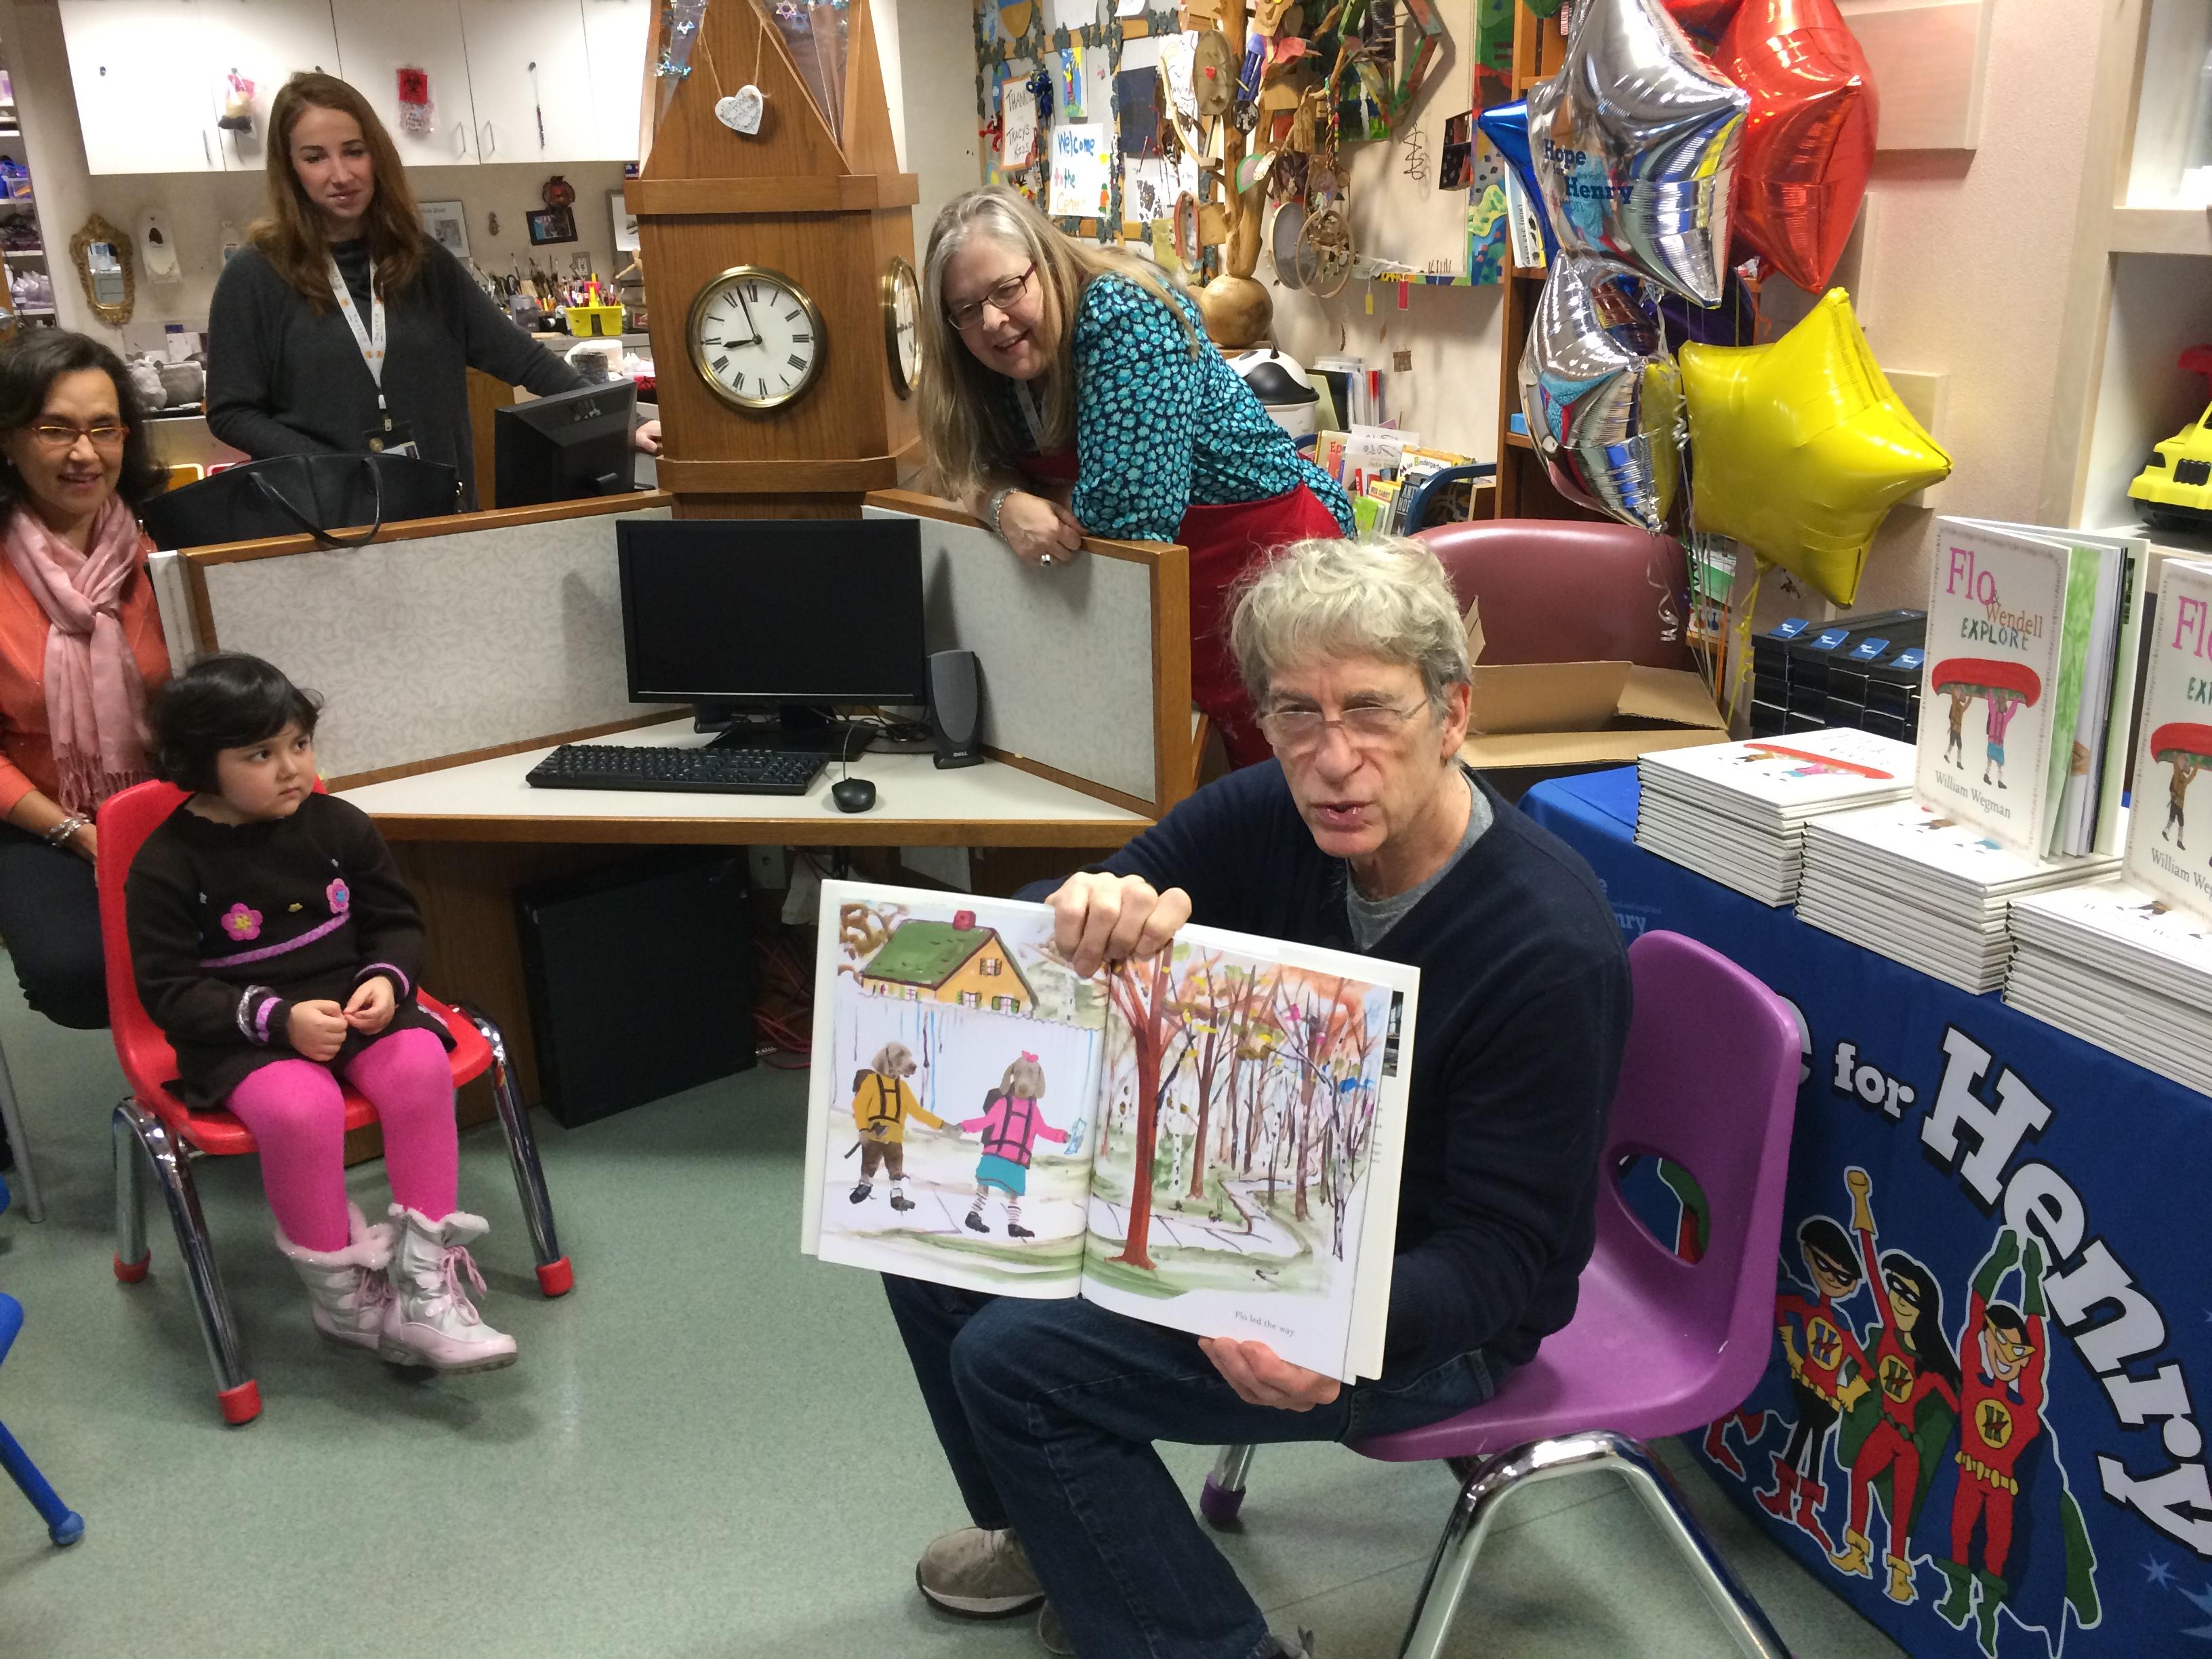 Famous photographer brings joy to hospitalized kids